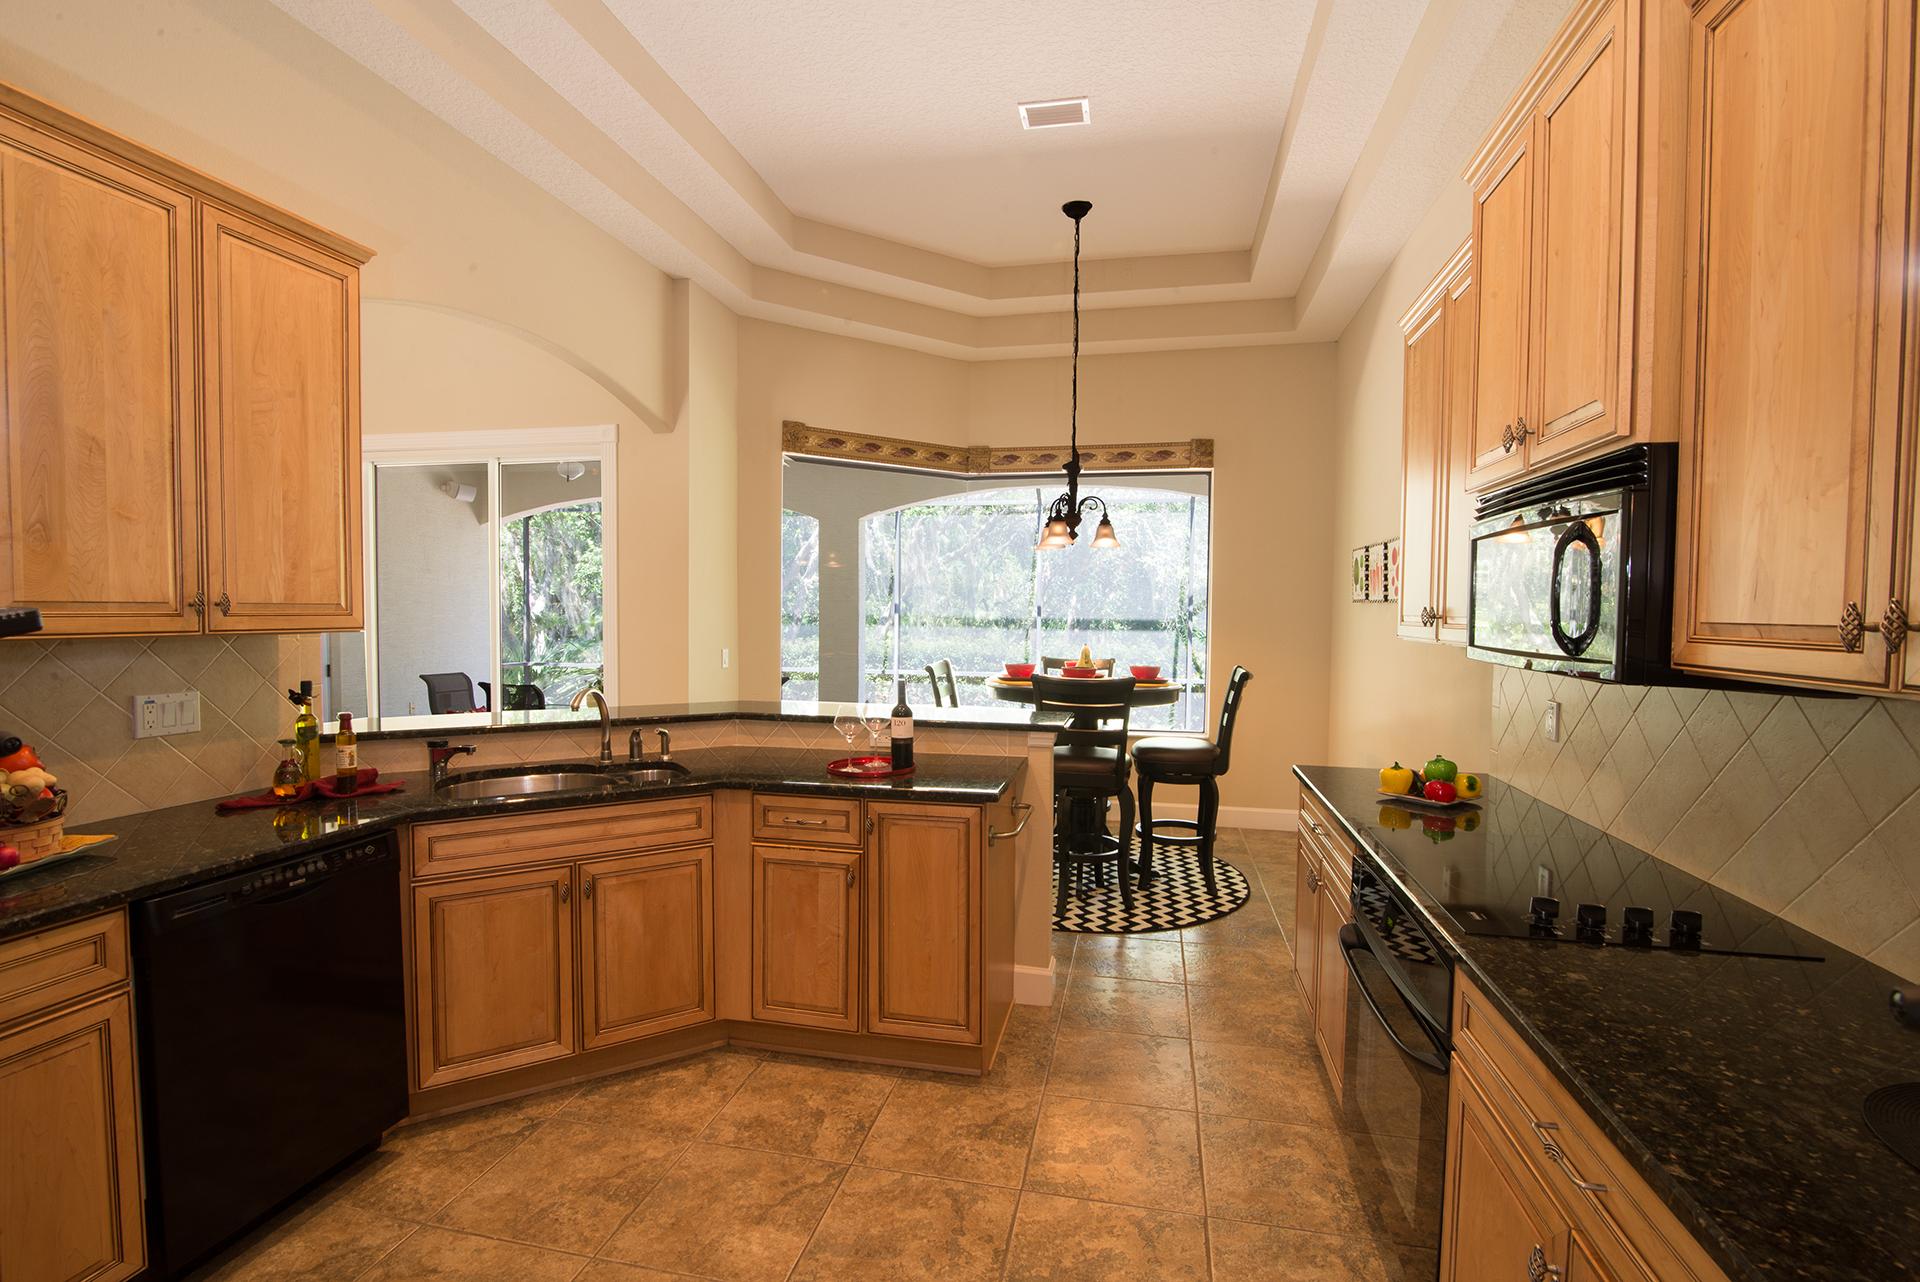 Staged-Assets-Home-Staging-Interior-Design-Palm-Coast-Florida-18